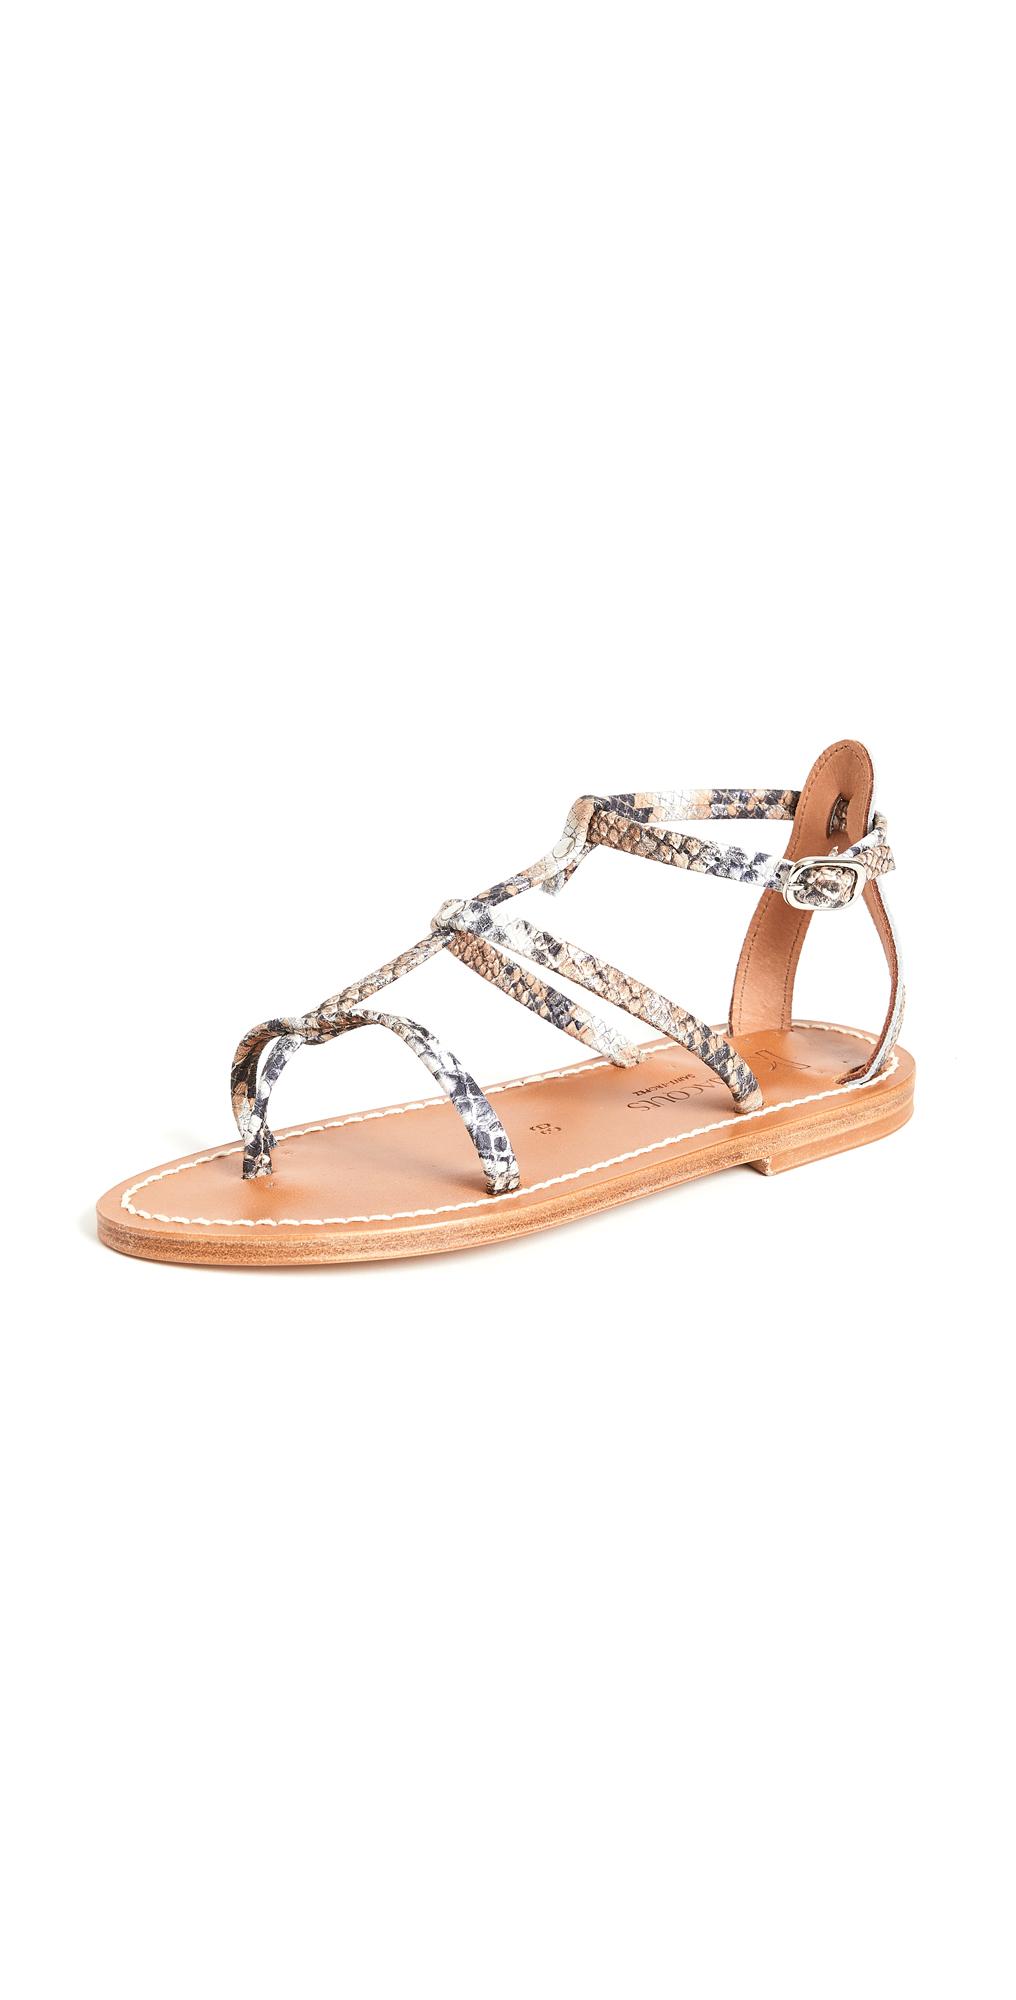 Antioche Sandals